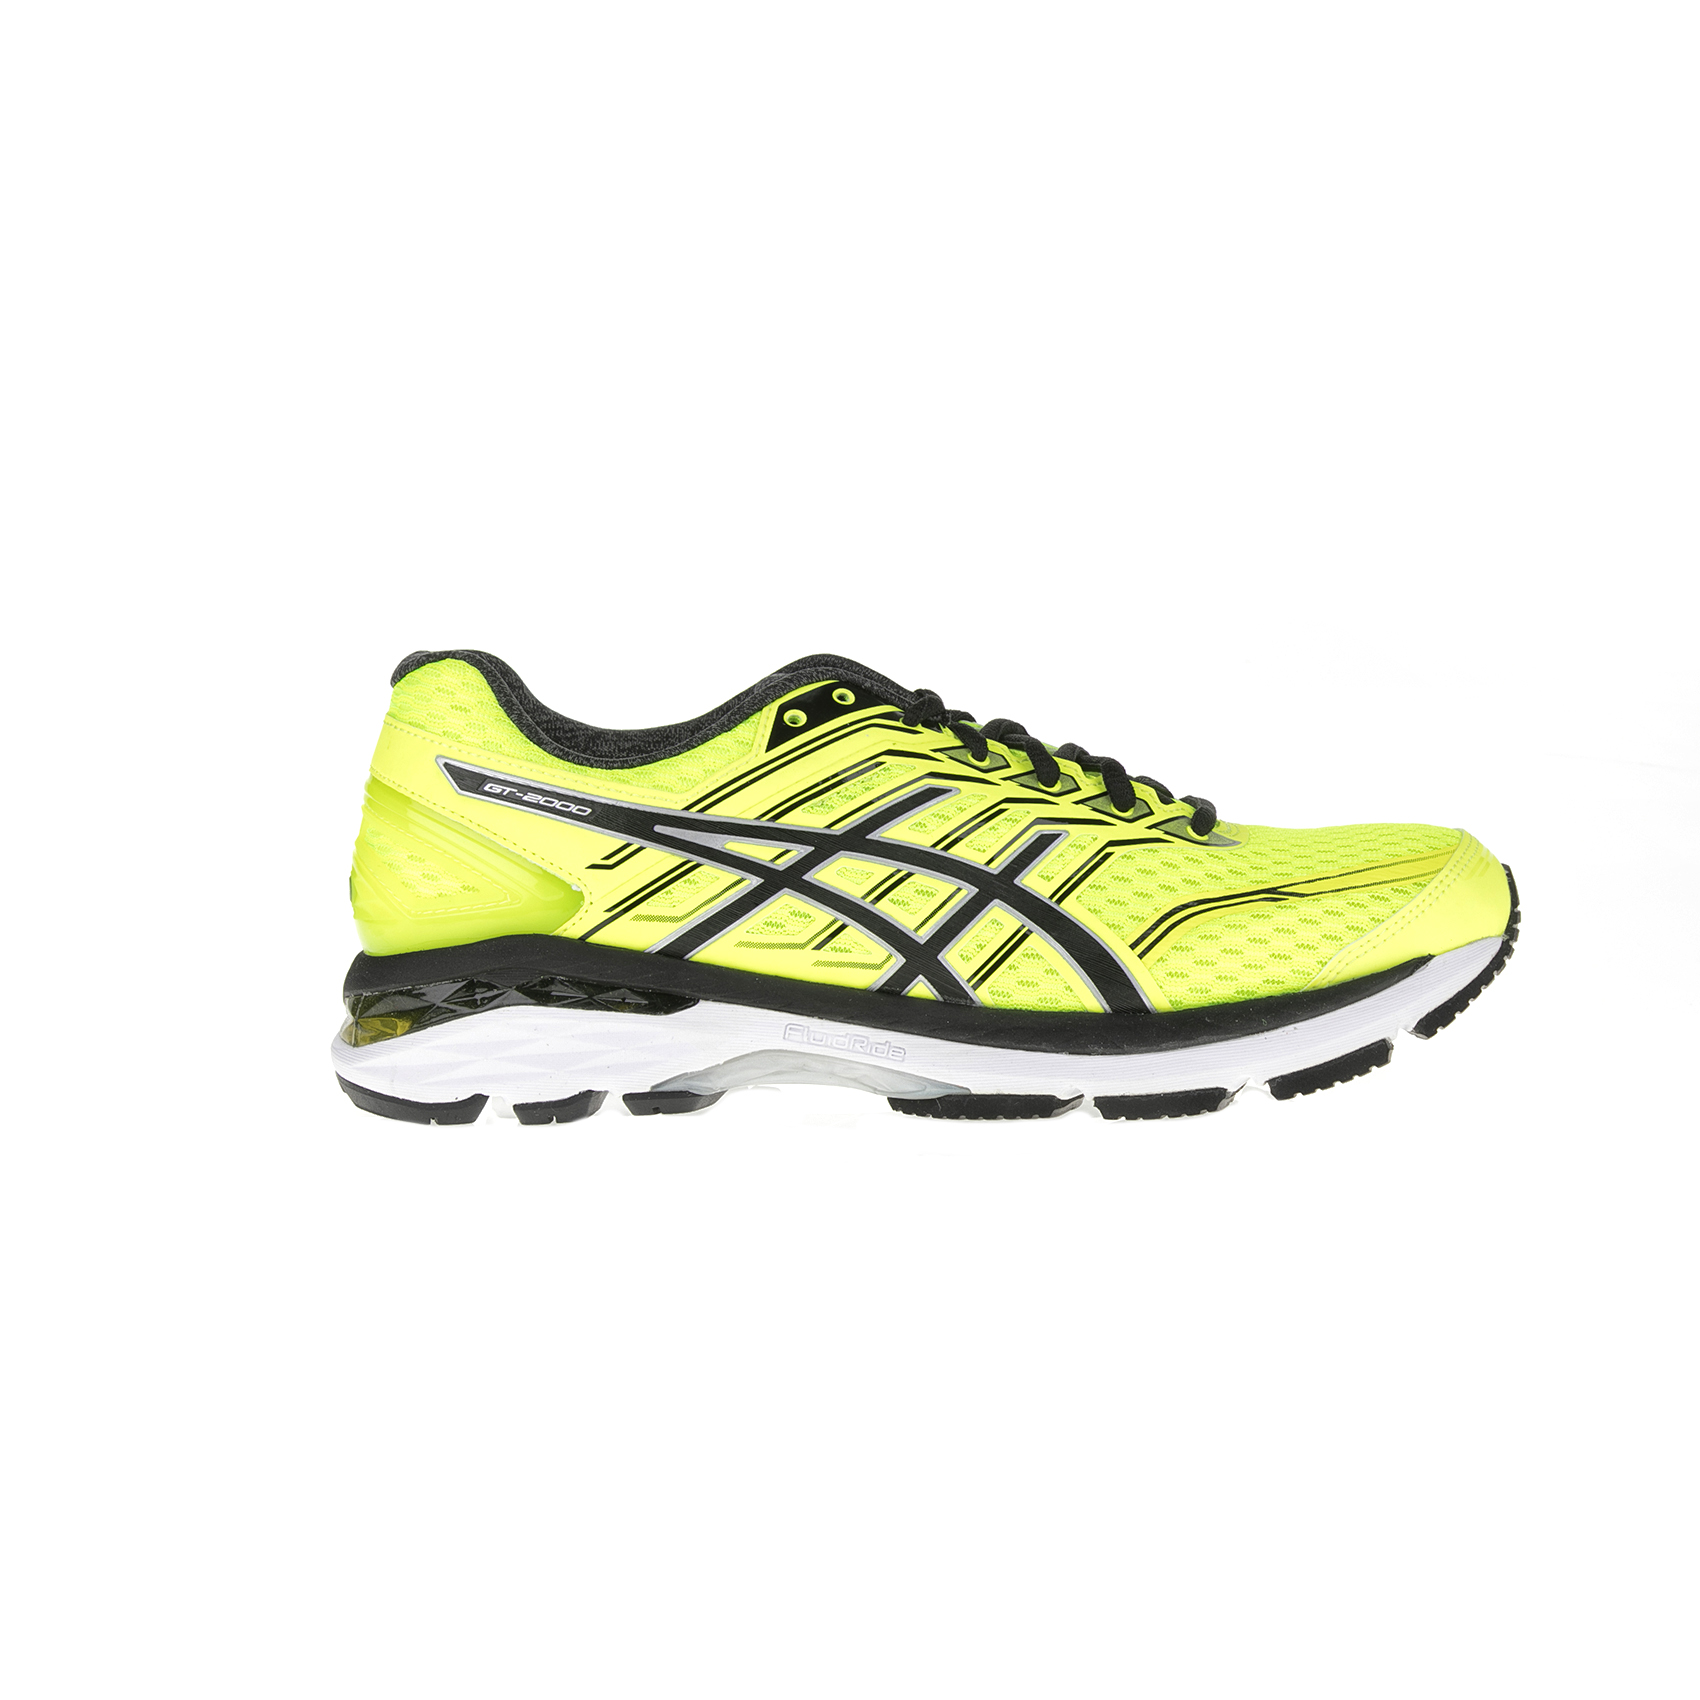 ASICS - Ανδρικά παπούτσια ASICS GT-2000 5 κίτρινα ανδρικά παπούτσια αθλητικά running